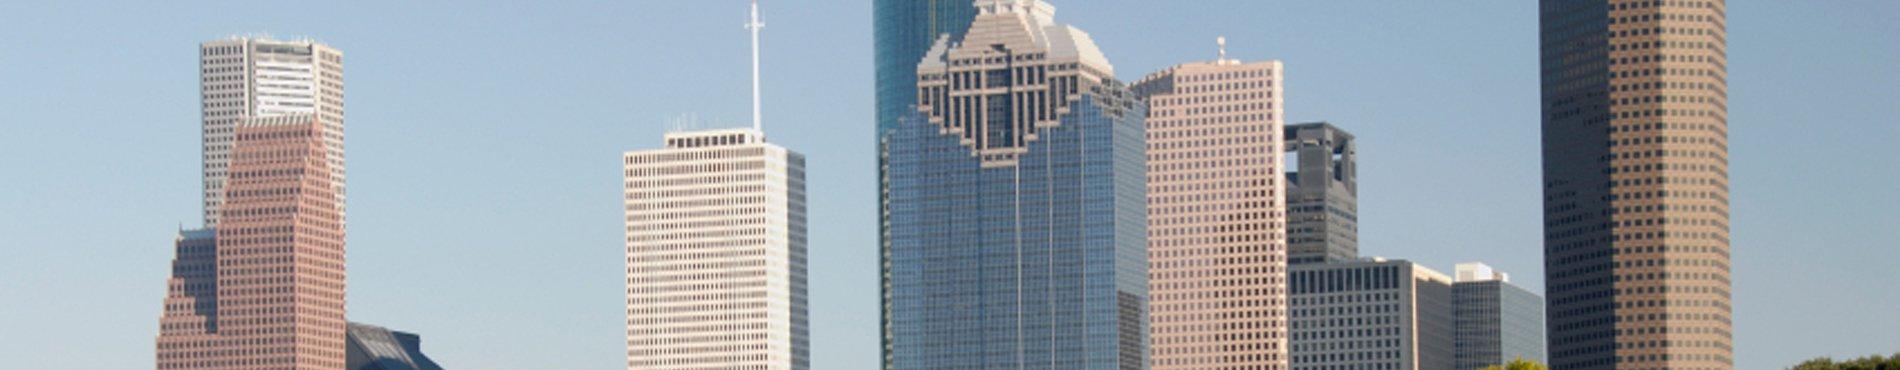 Houston Header & Houston Portable Moving Storage Containers | SMARTBOX